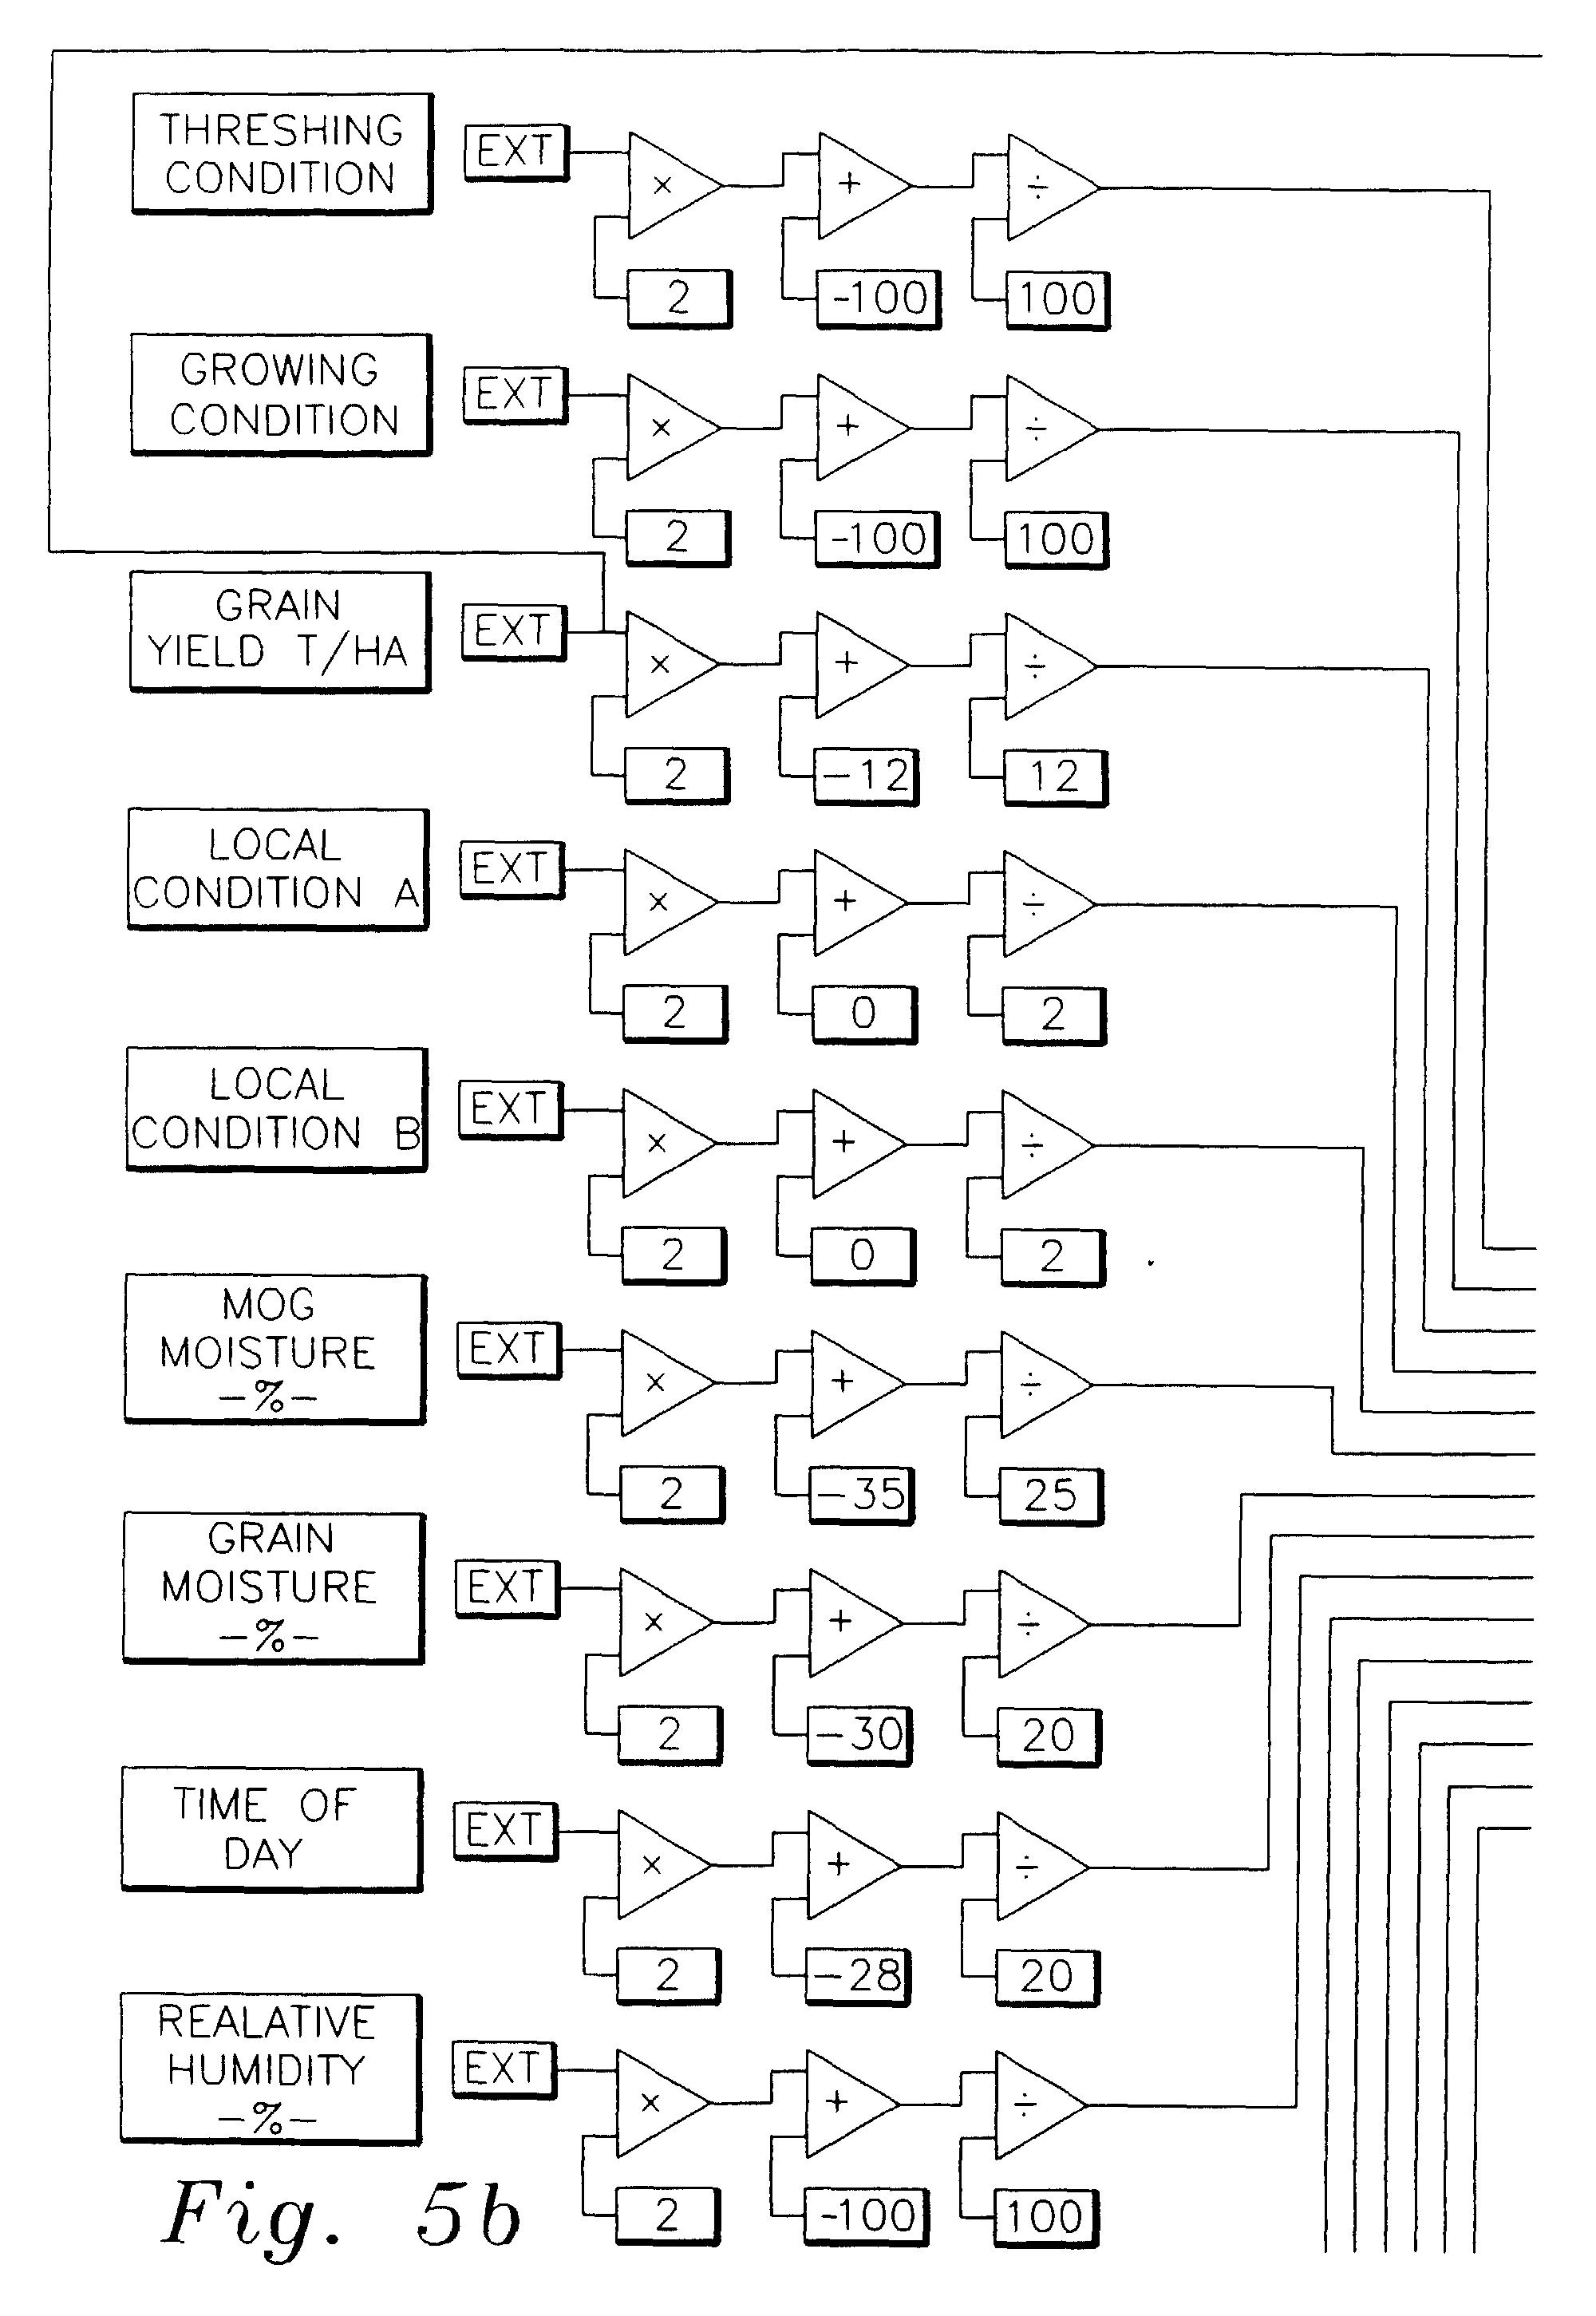 john deere 9600 wiring diagram john deere 2130 wiring John Deere Electrical Diagrams john deere 2150 wiring diagram